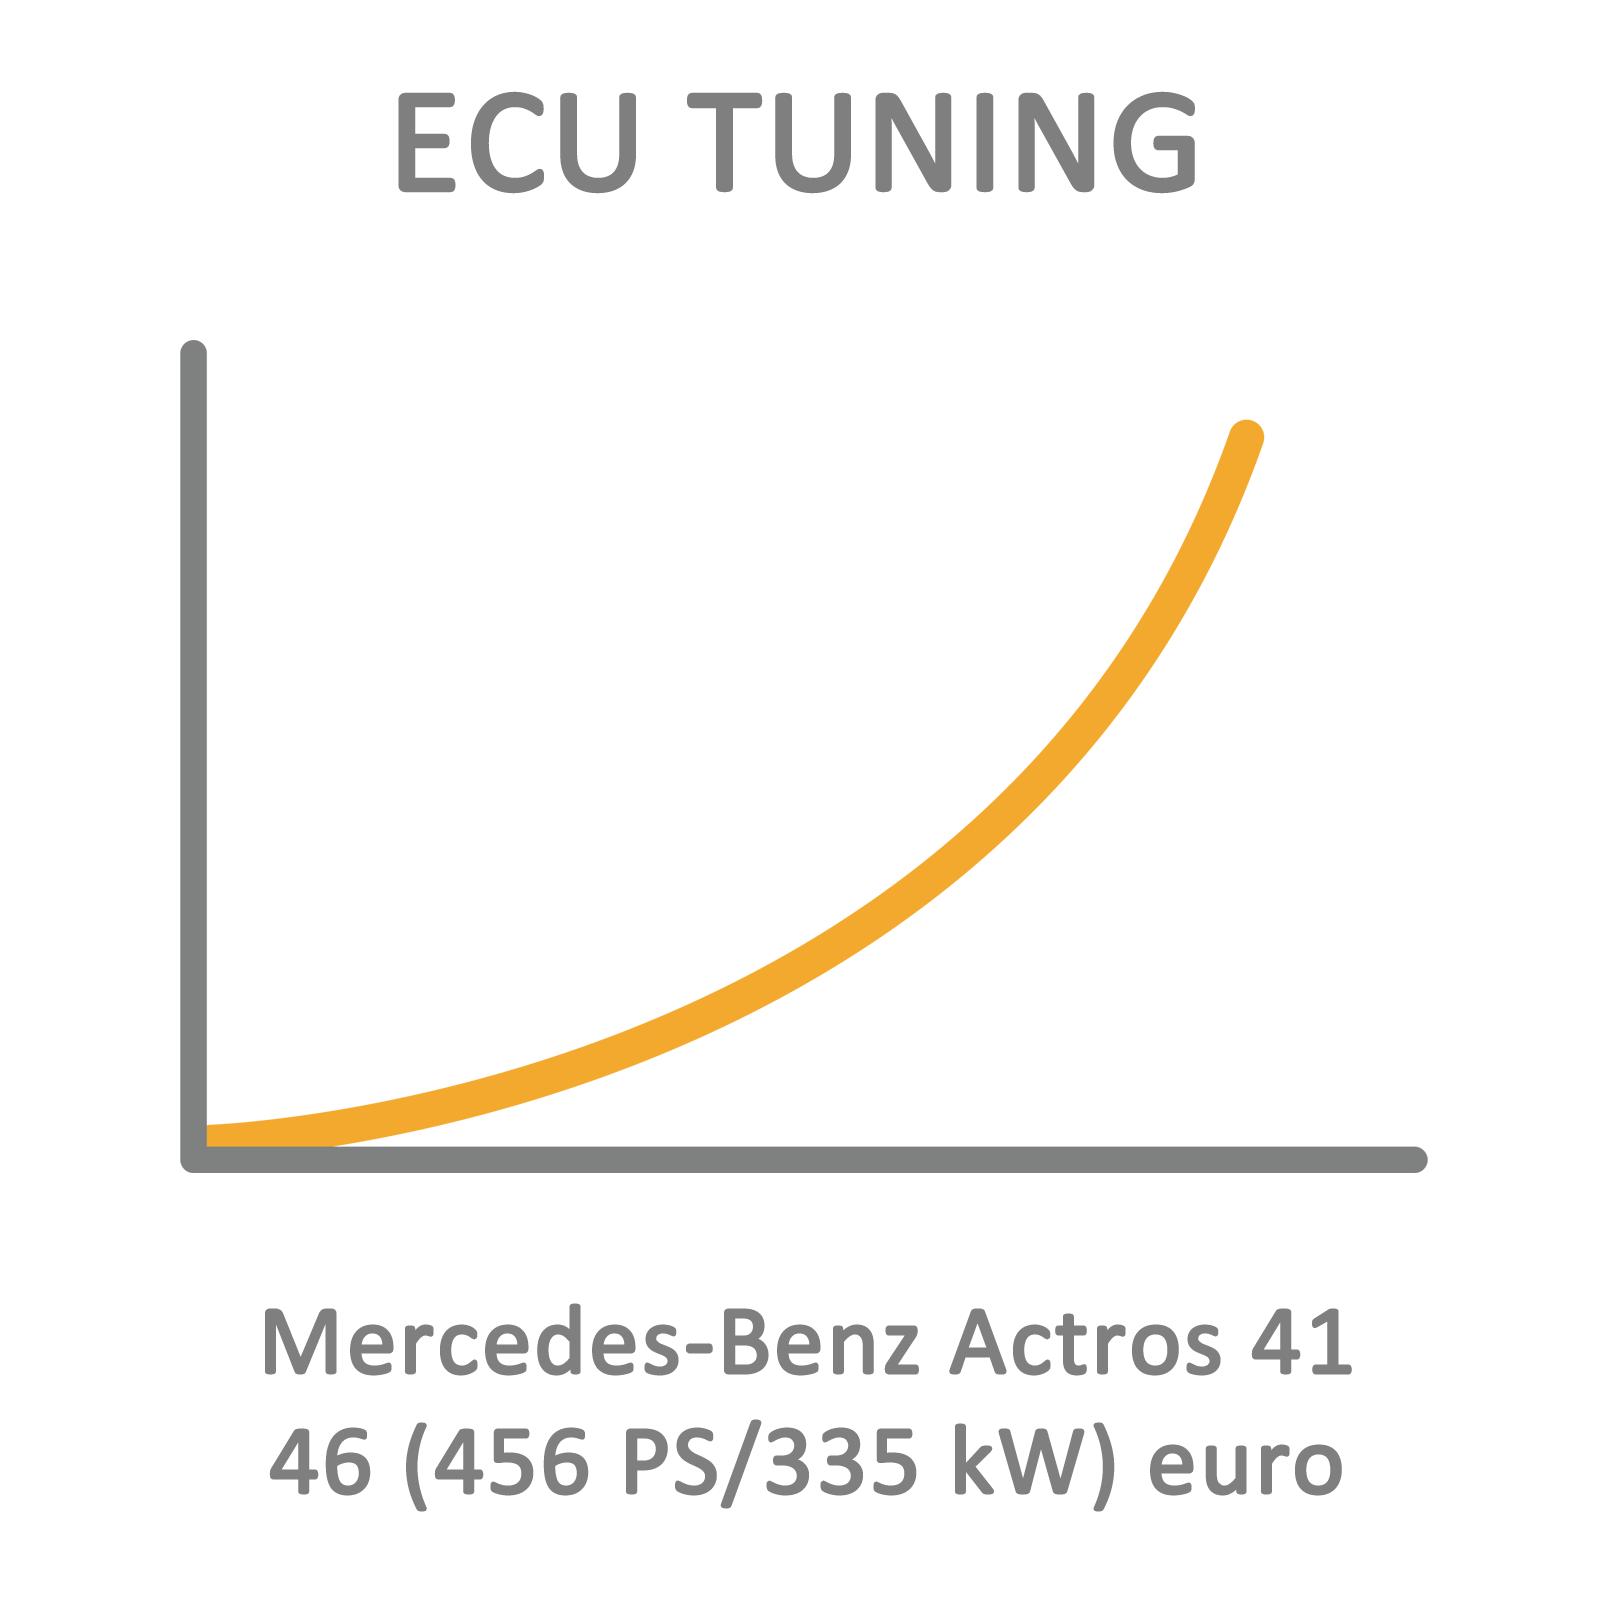 Mercedes-Benz Actros 41 46 (456 PS/335 kW) euro 3+4+5 ECU